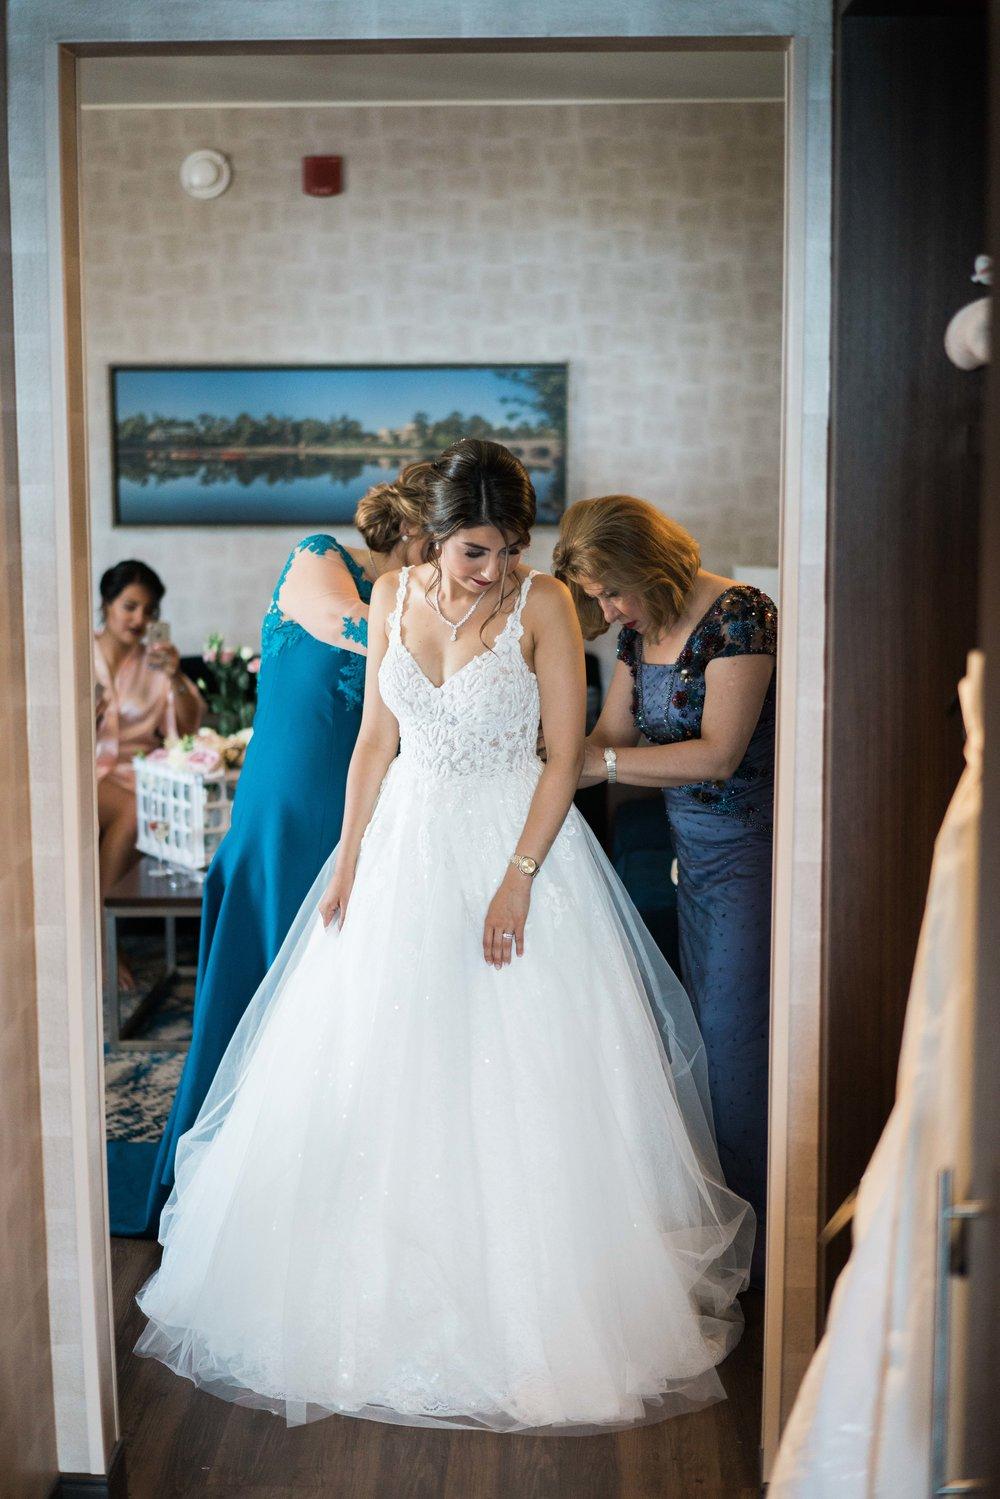 Tara and Afshin Wedding Photography at Samuels Grand Manor by Stefan Ludwig Photography in Buffalo NY-152.jpg